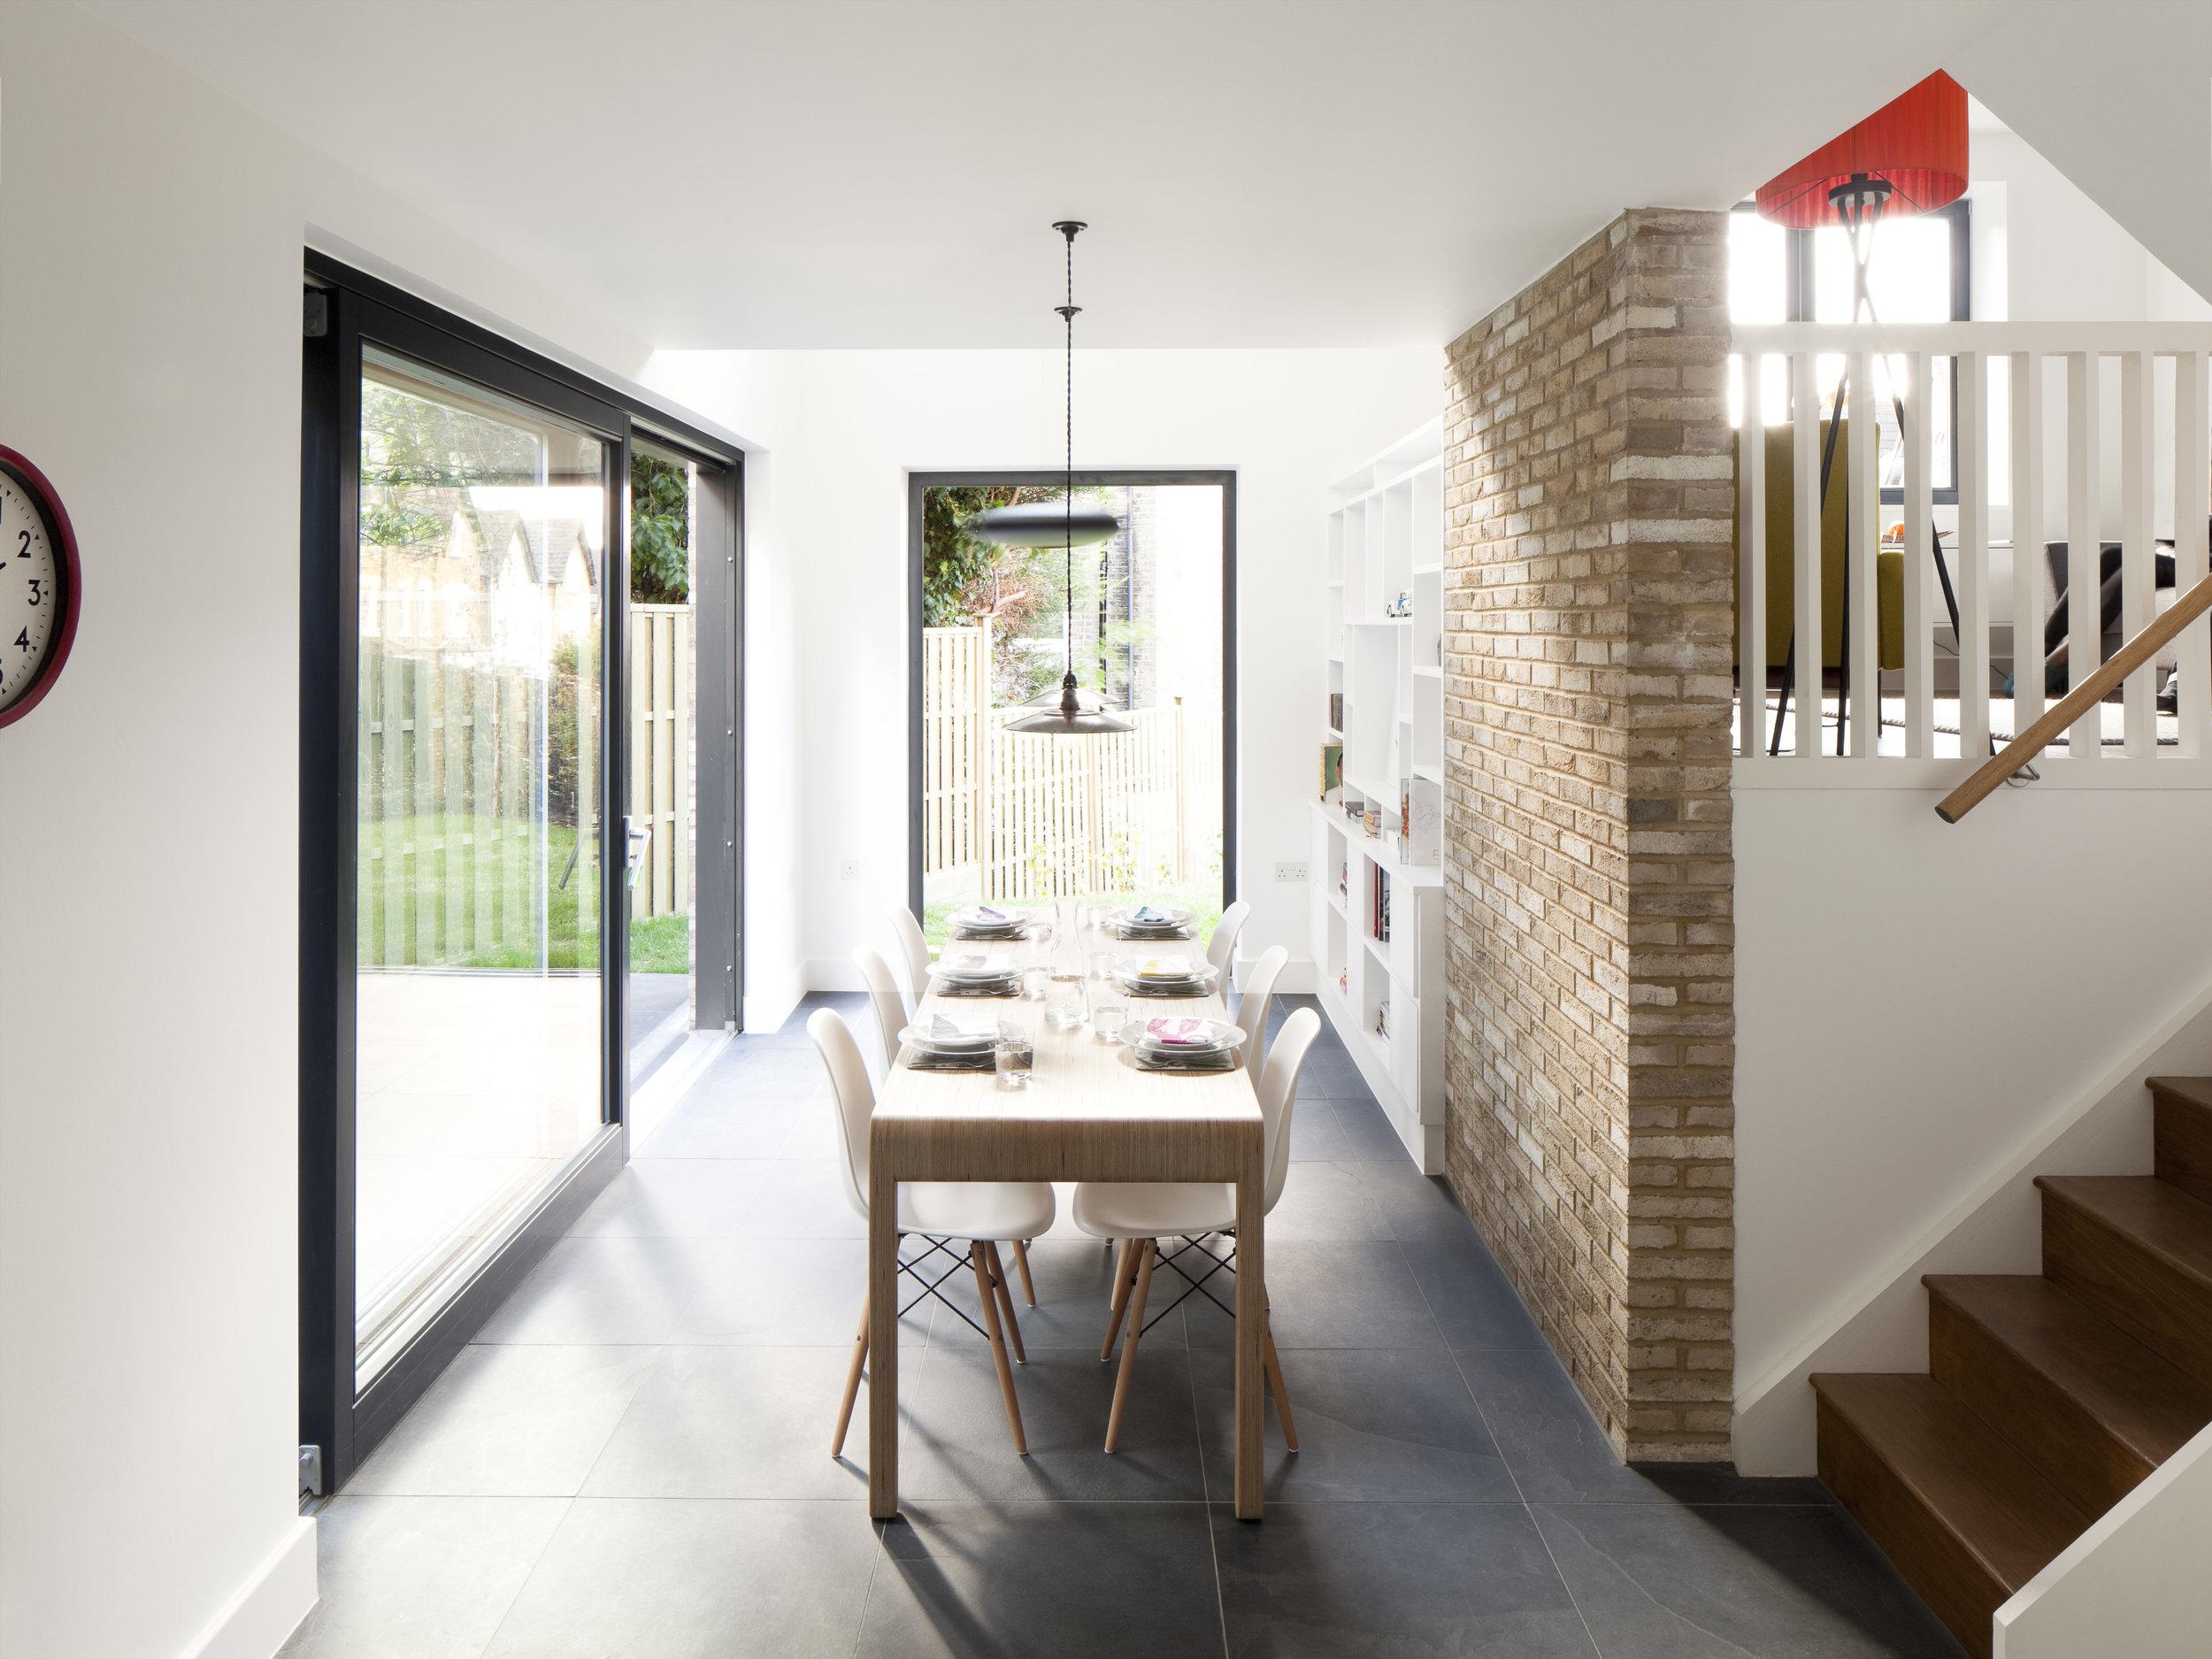 Essex Mews Eat - MW Architects